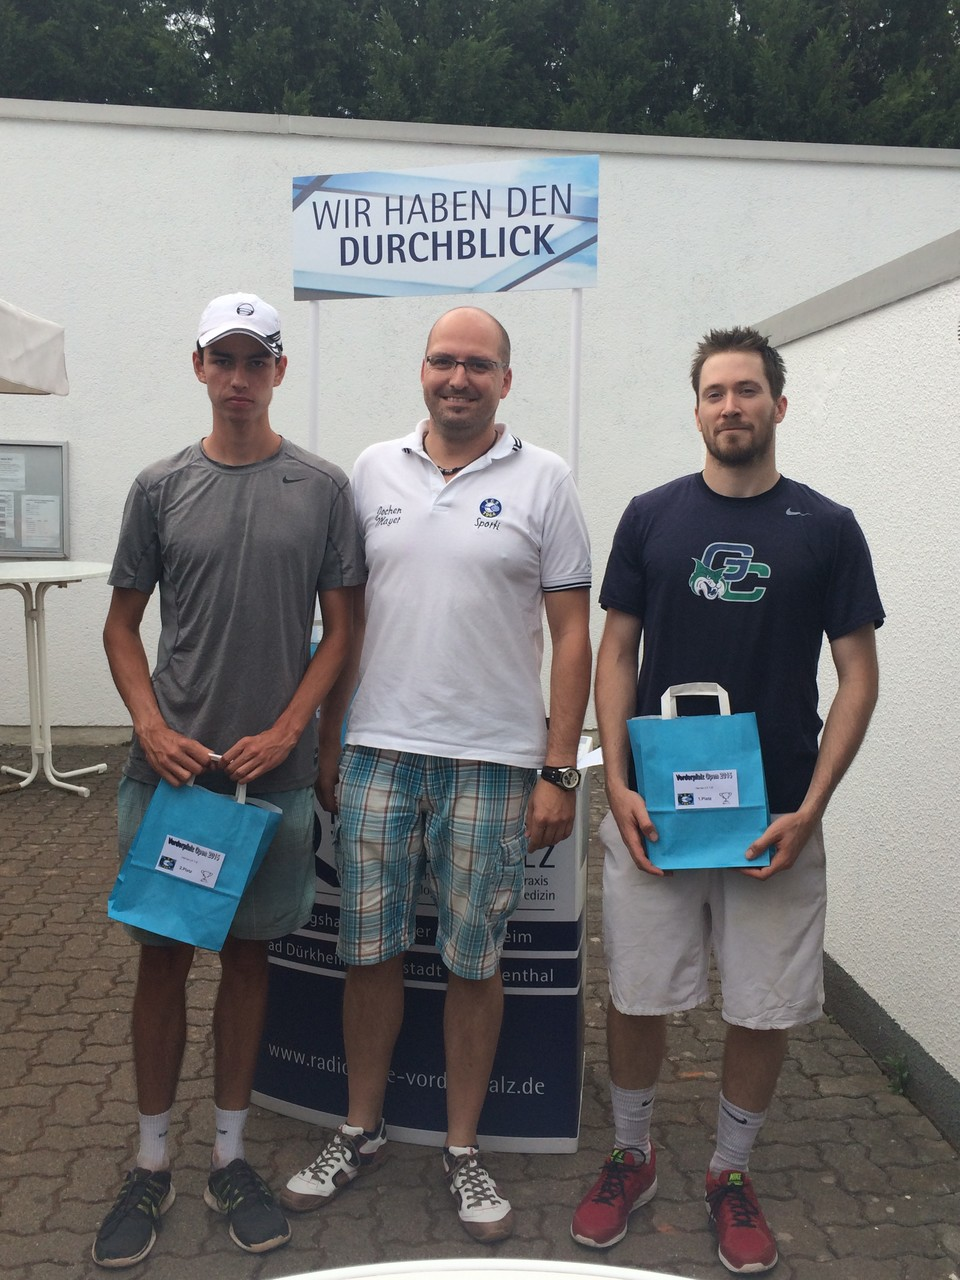 Herren LK 1-8: v.l. 2.Niklas Noll (BASF TC Ludwigshafen),  Sieger Tobias Rausch (TC Schwarz-Gelb Heidelberg)